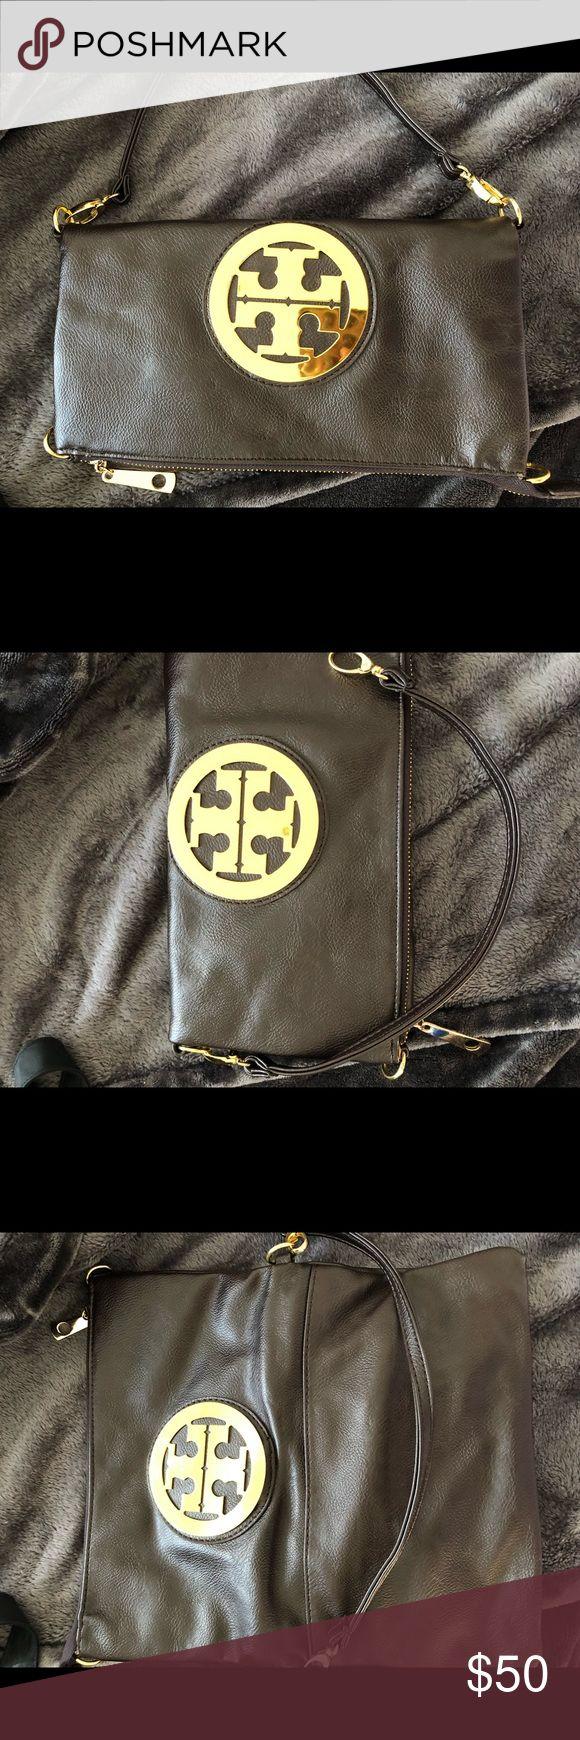 Tory Burch Brown Clutch Bag🔥 Tory Burch Brown Clutch Bag - never used Tory Burch Bags Clutches & Wristlets